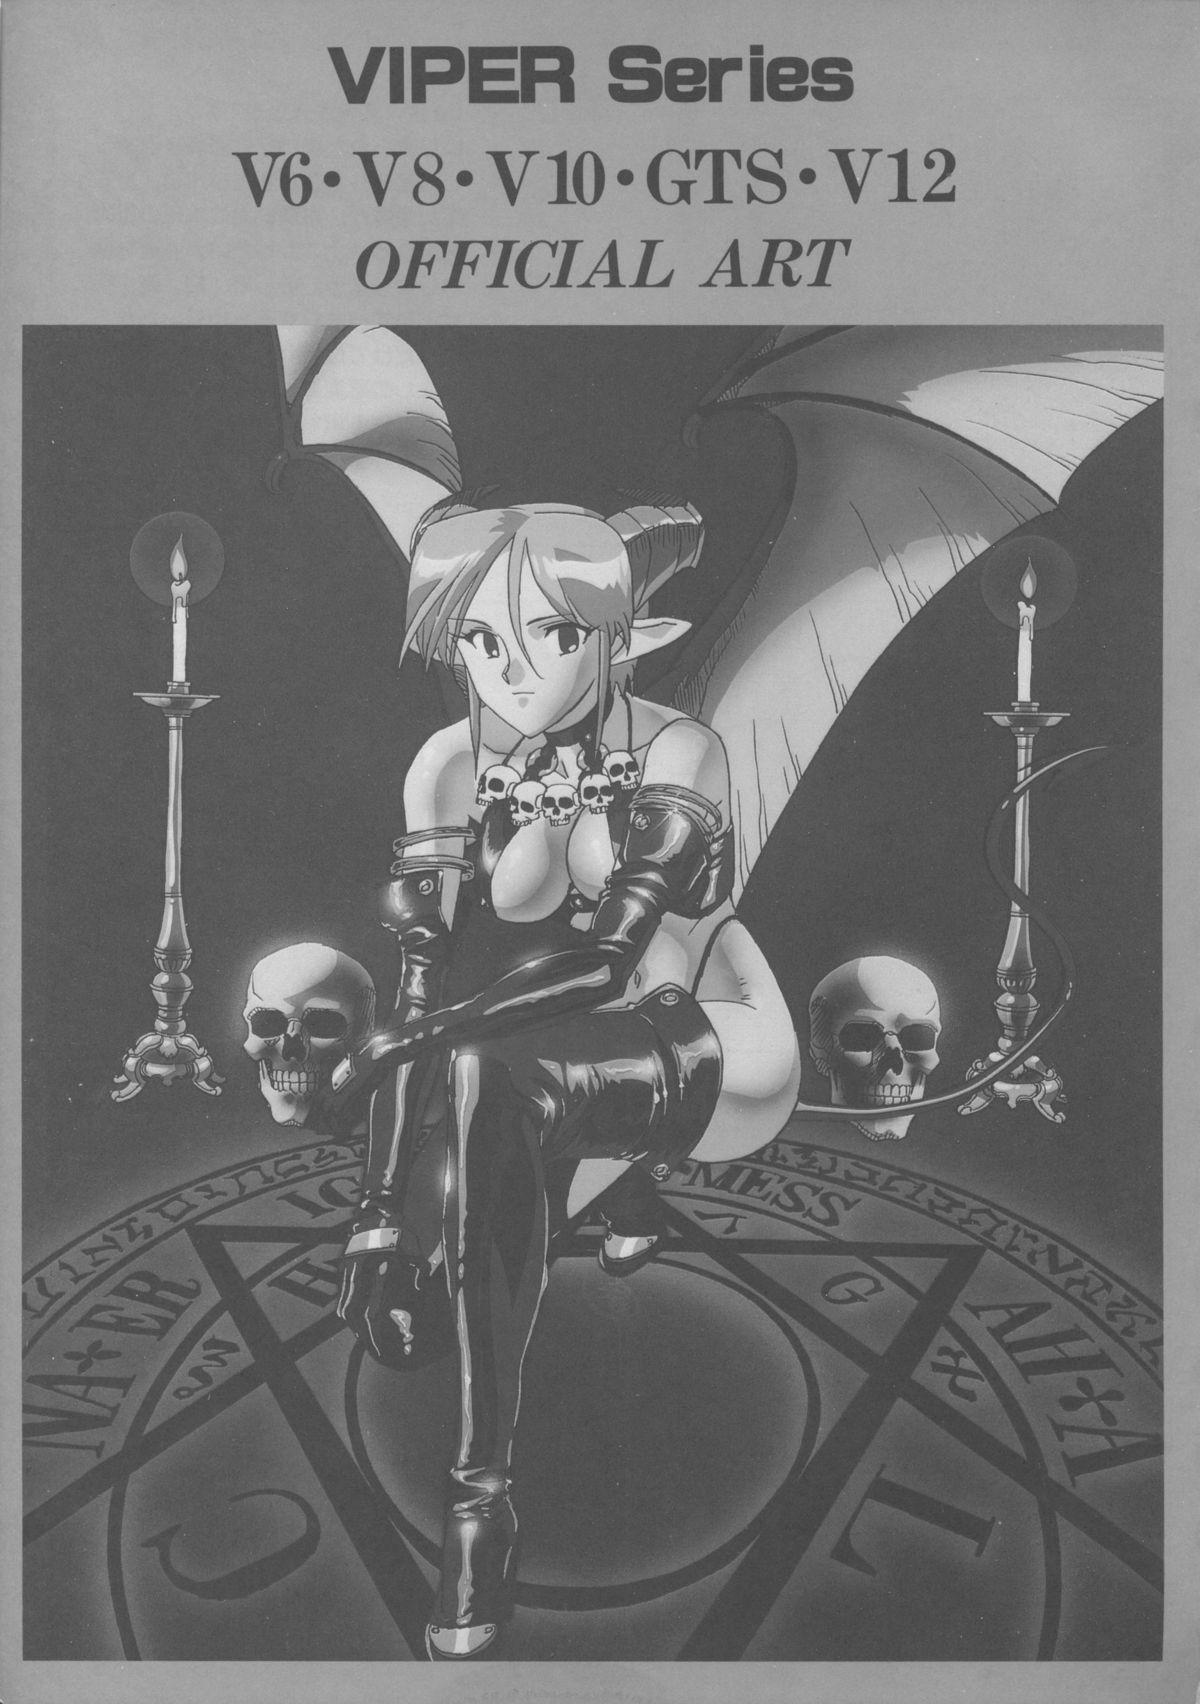 VIPER Series Official Artbook 35